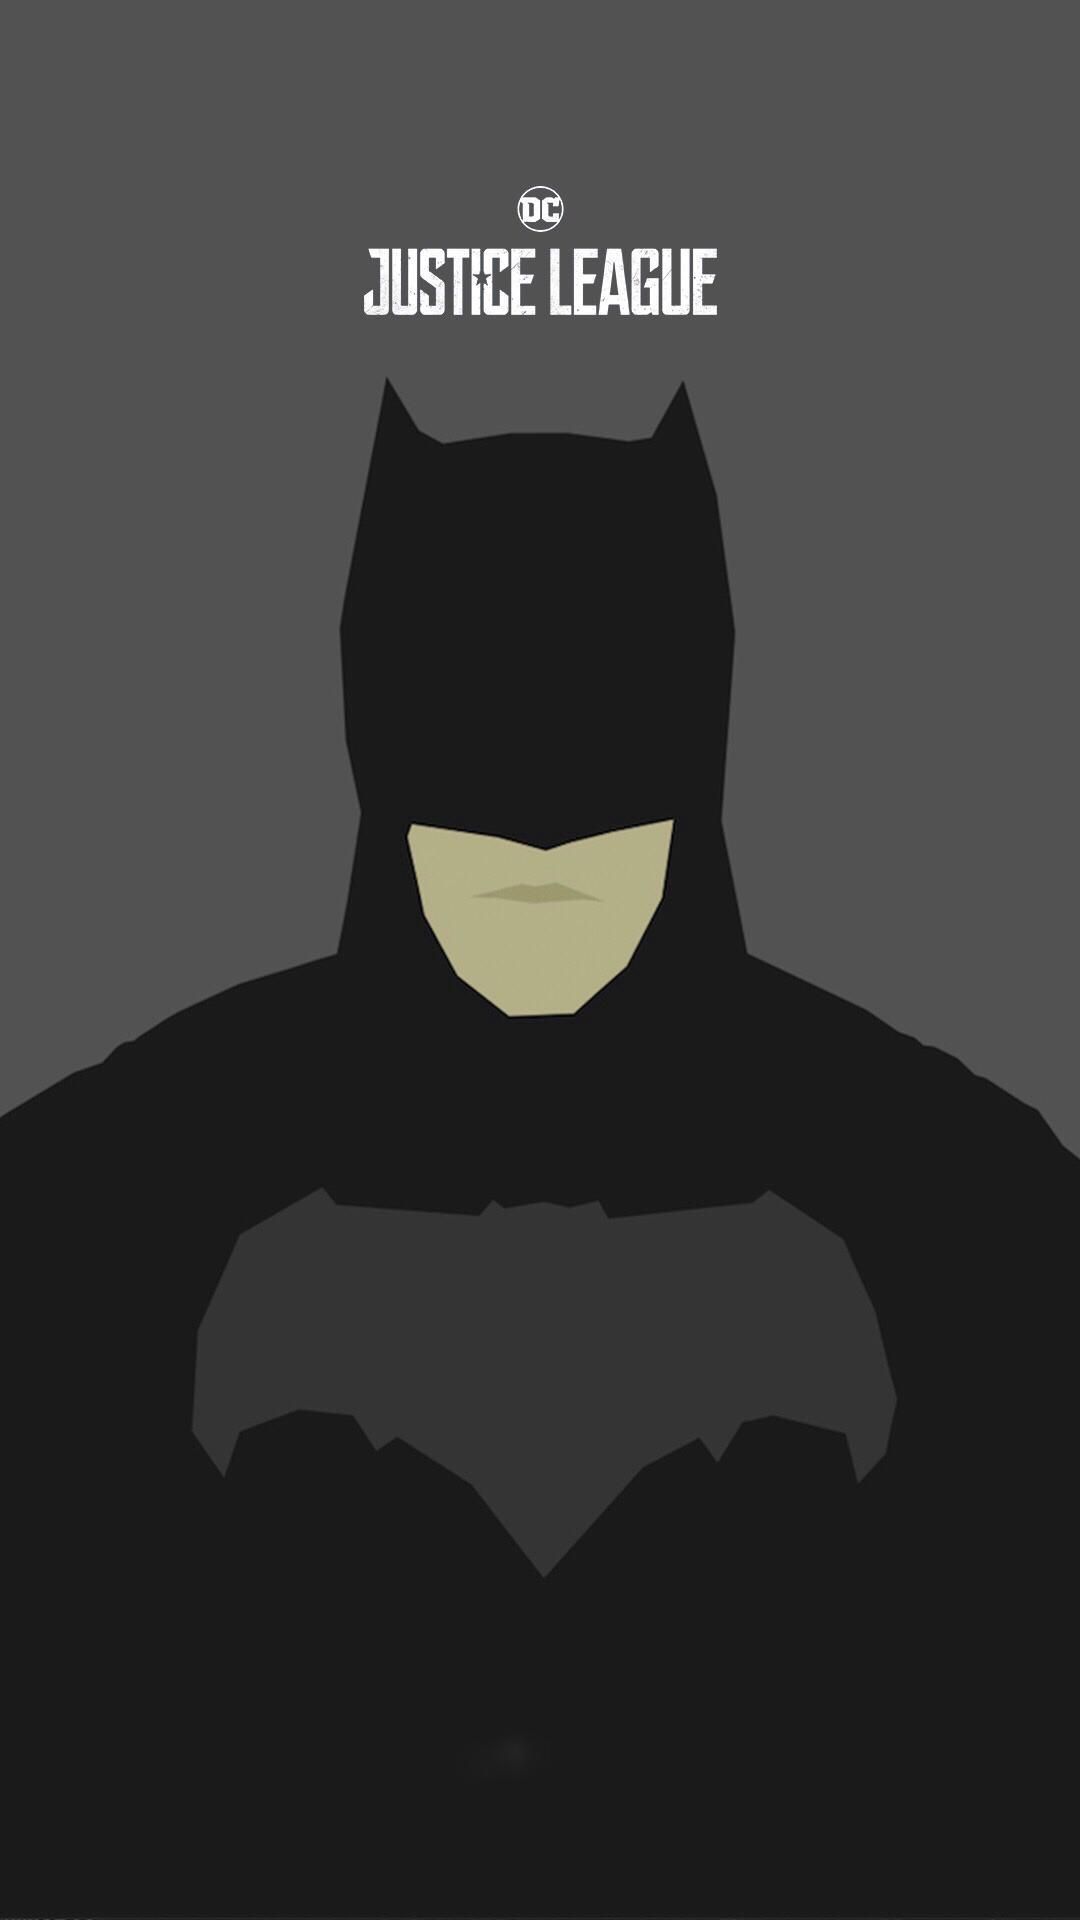 Dc Justice League Batman Download At Http Www Myfavwallpaper Com 2018 03 Dc Justice League Batman Html Ip Batman Justice League Dc Comics Wallpaper Iphone